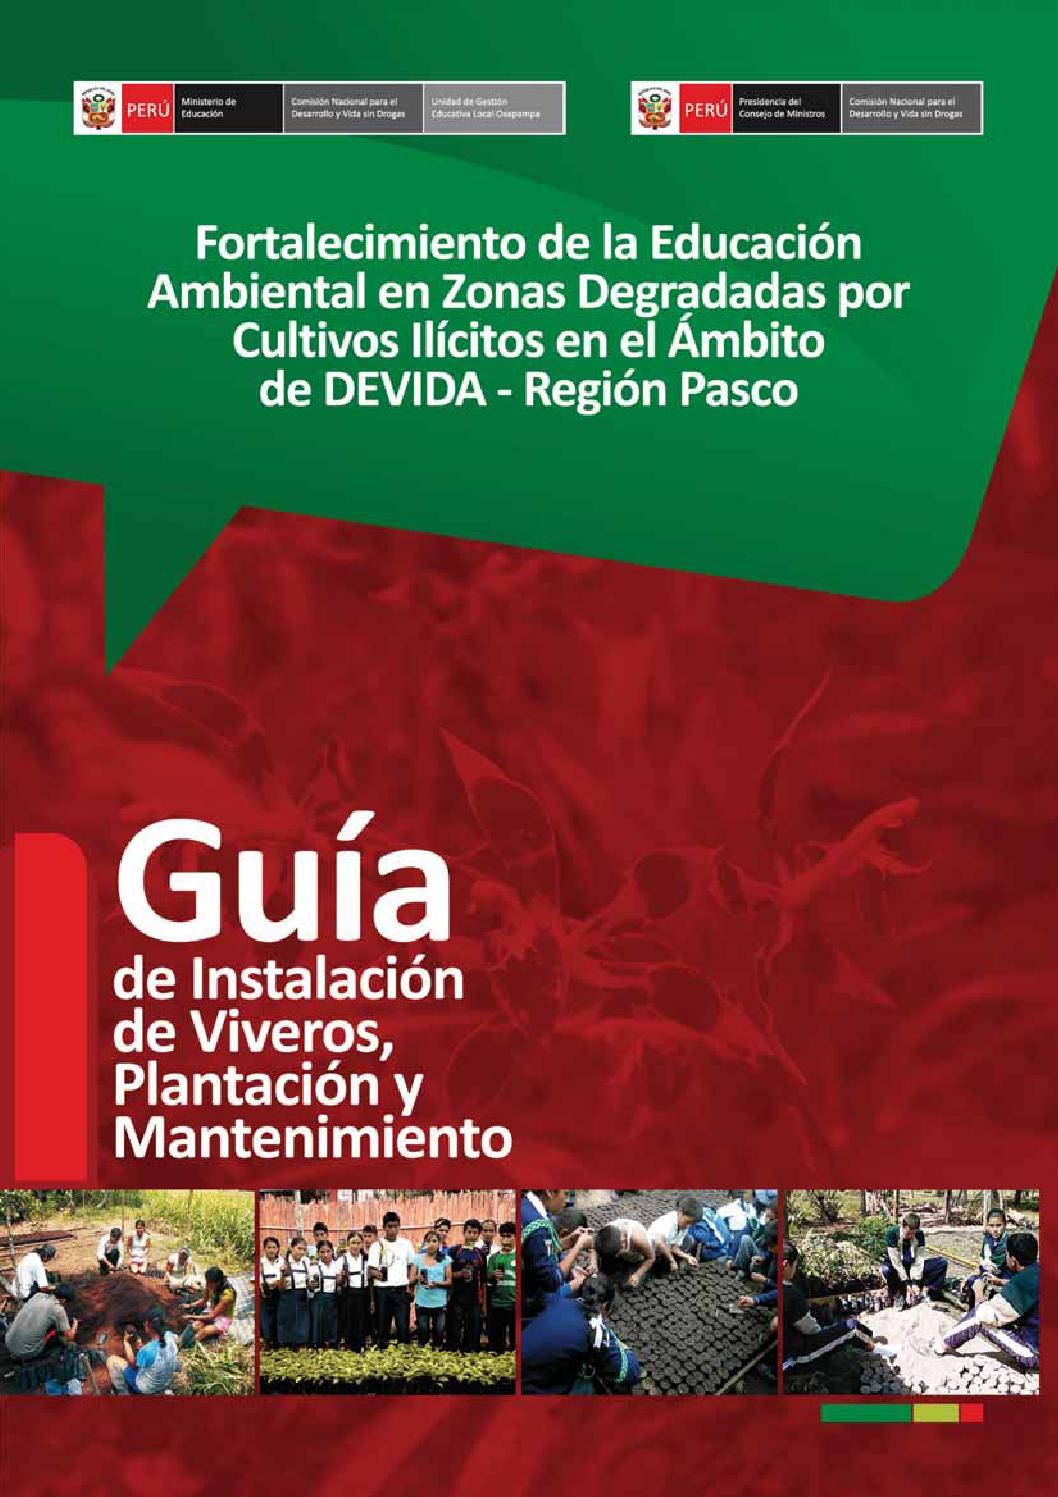 Gu a instalaci n de viveros pdf ligero by prea pasco issuu for Partes de un vivero forestal